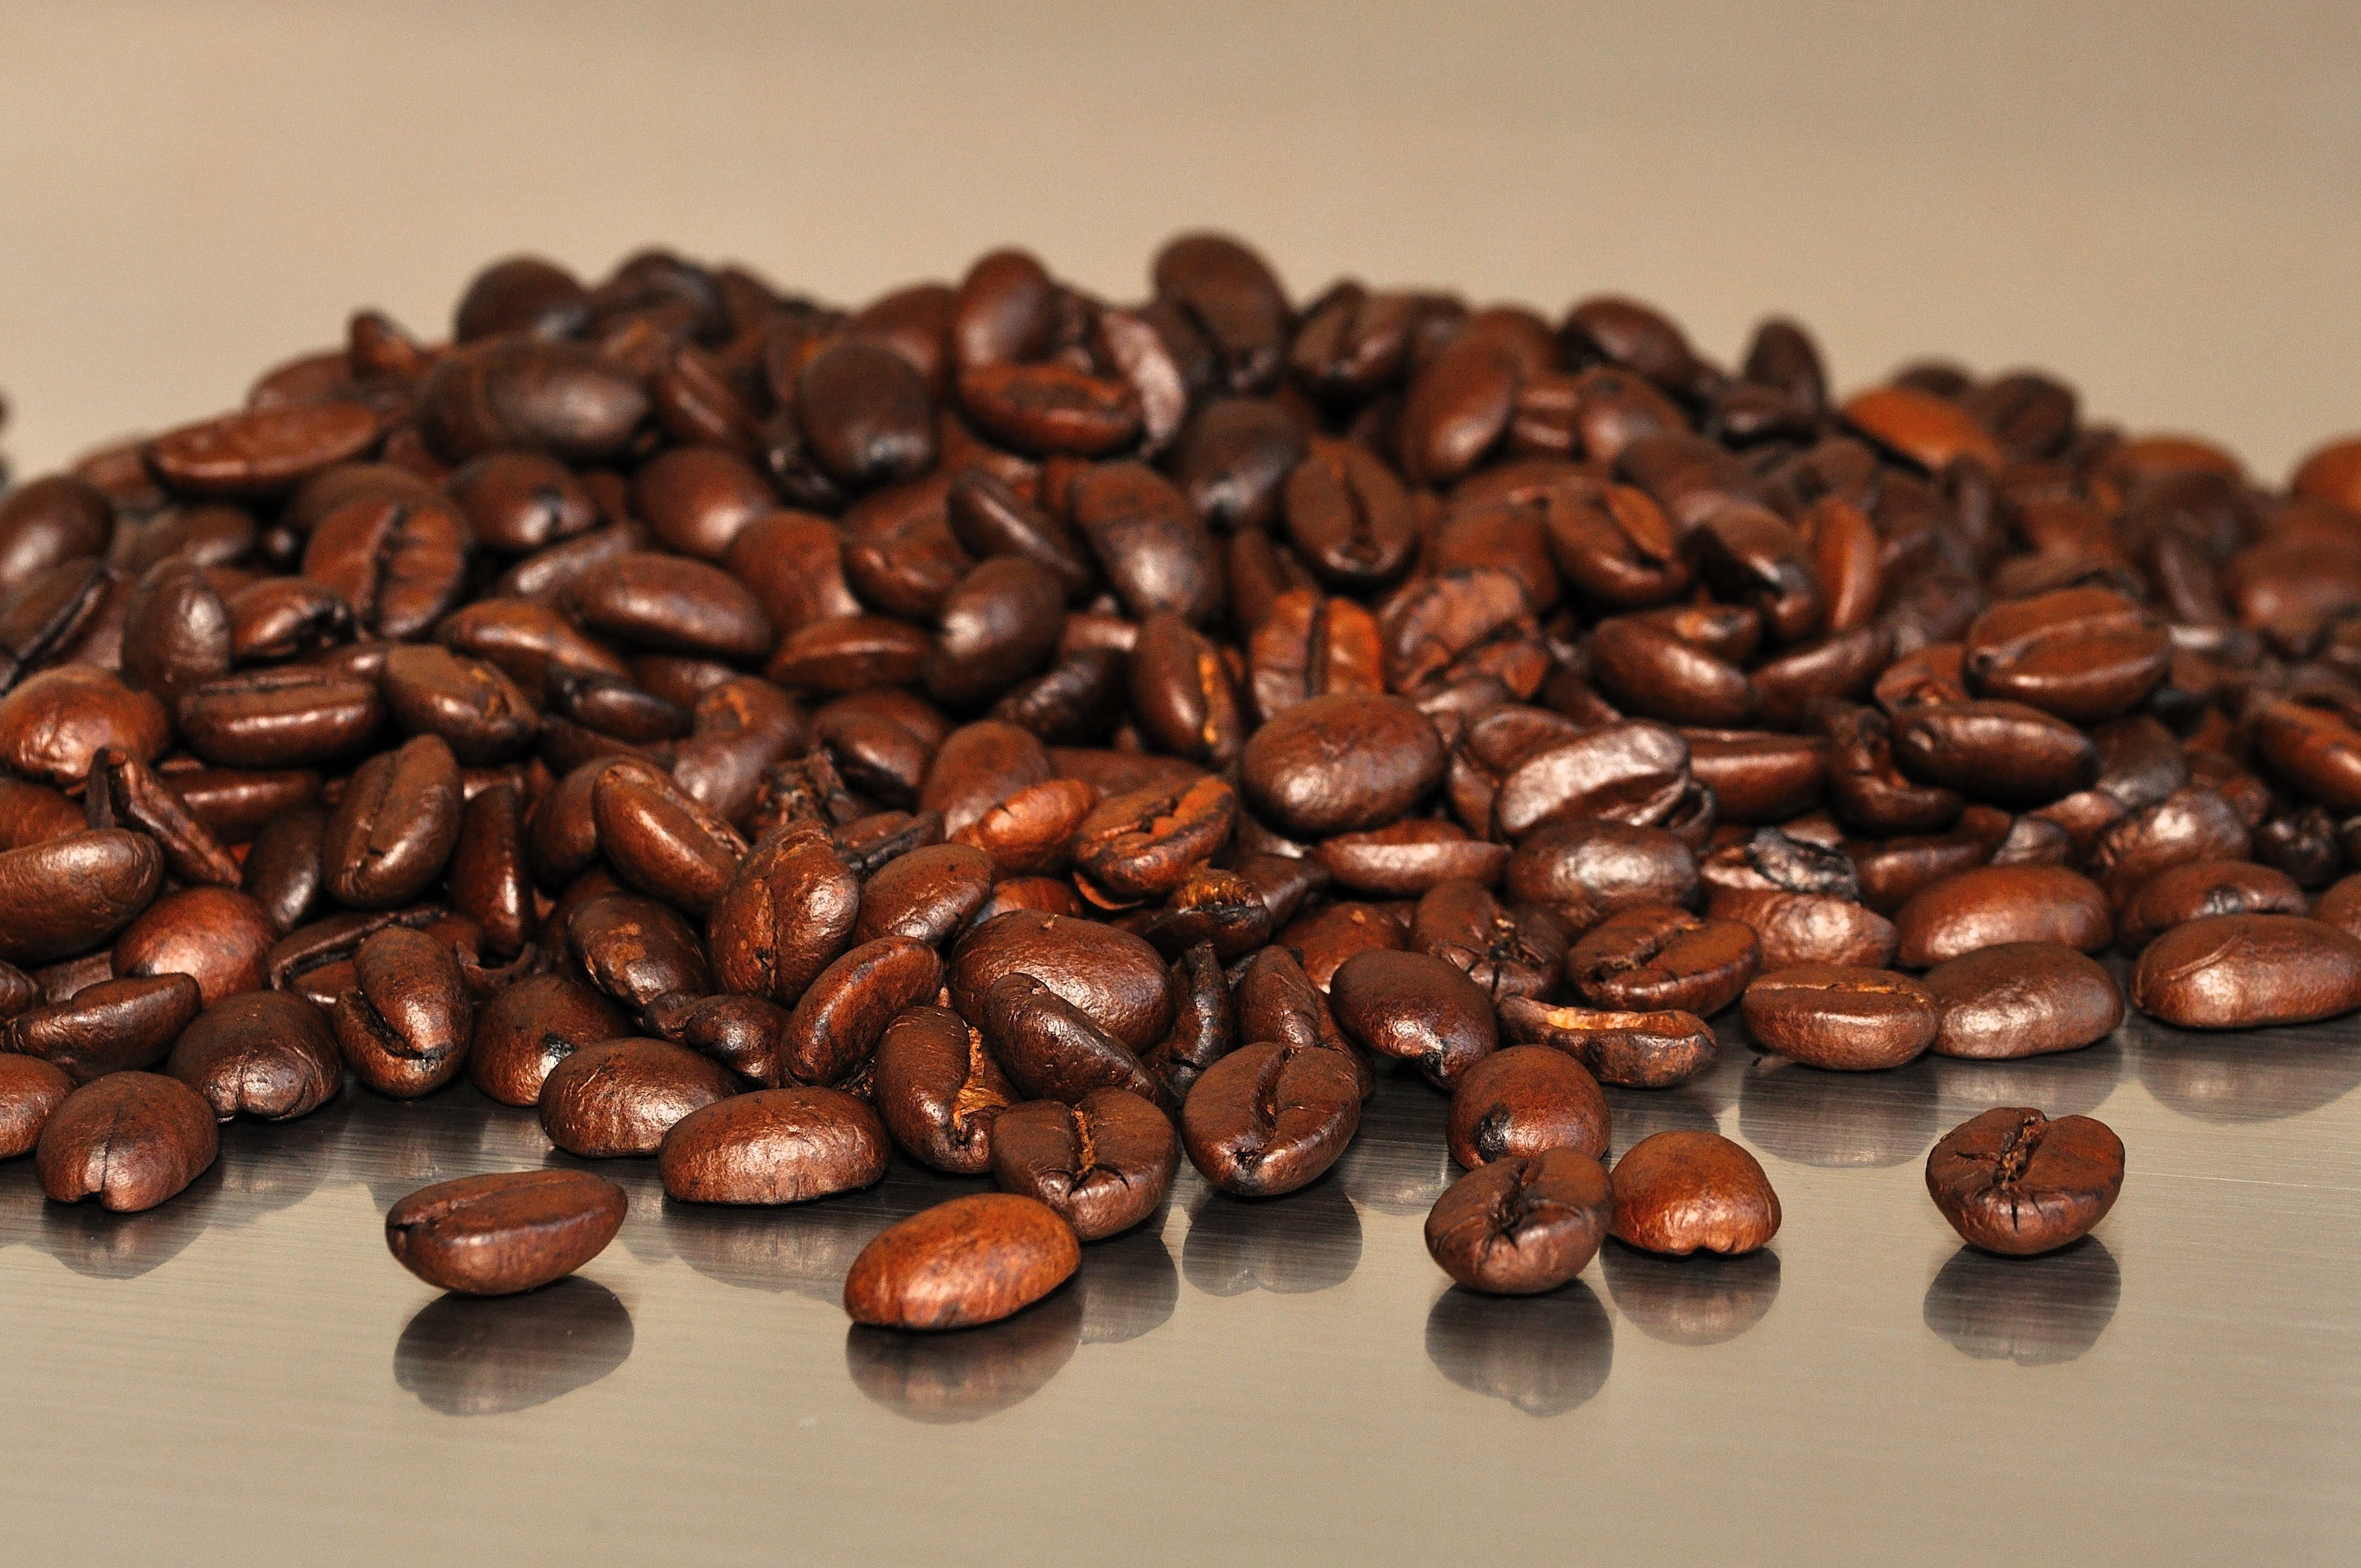 Brown coffee beans photo